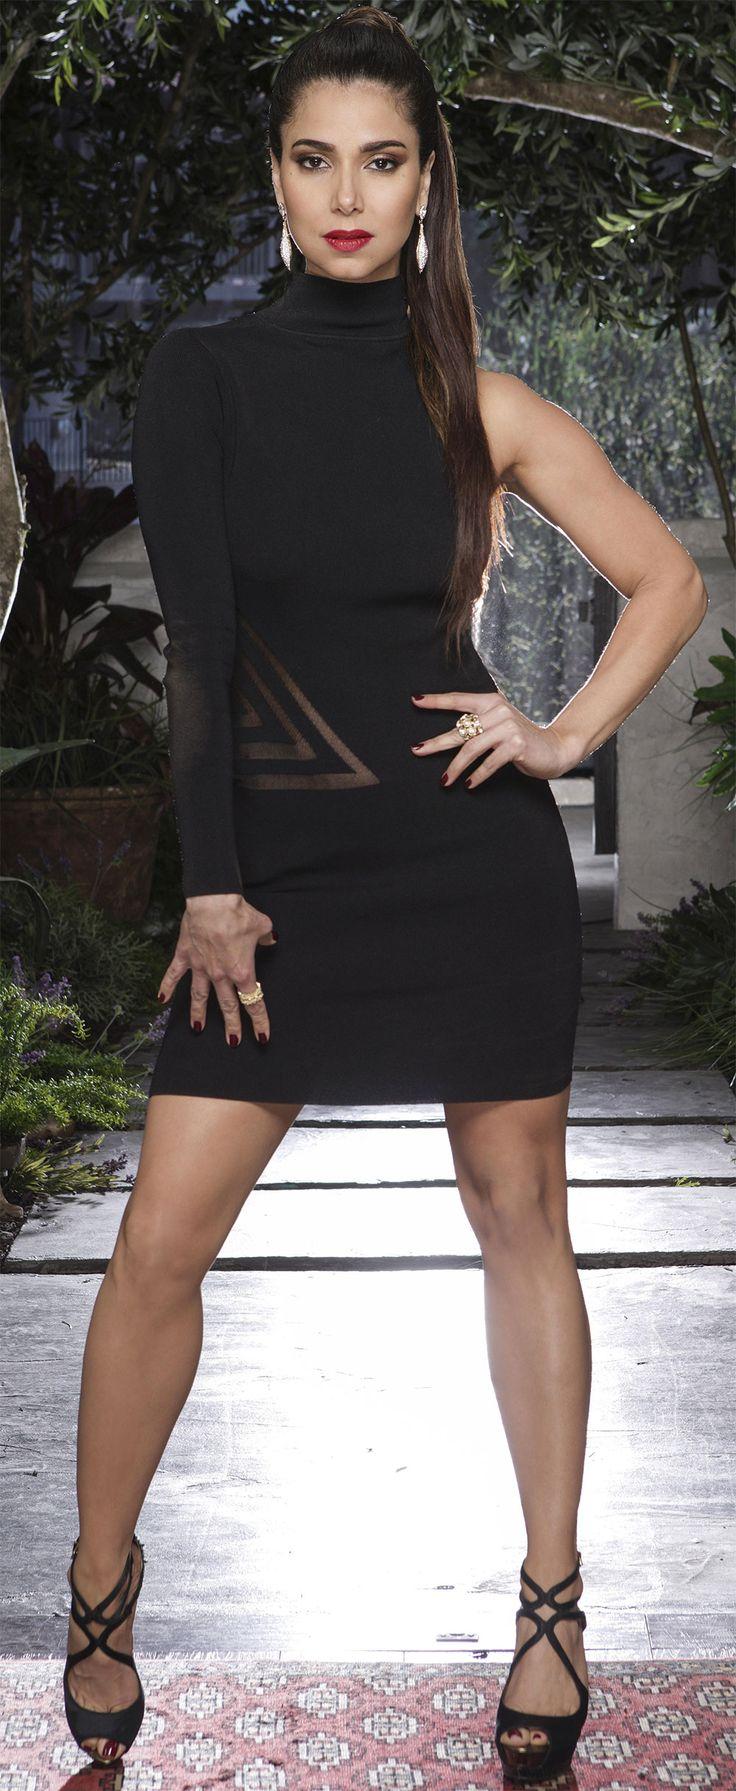 Shop Carmen Luna's fashion, style, wardrobe, and clothing from Devious Maids! http://www.pradux.com/tv/devious-maids/carmen-luna